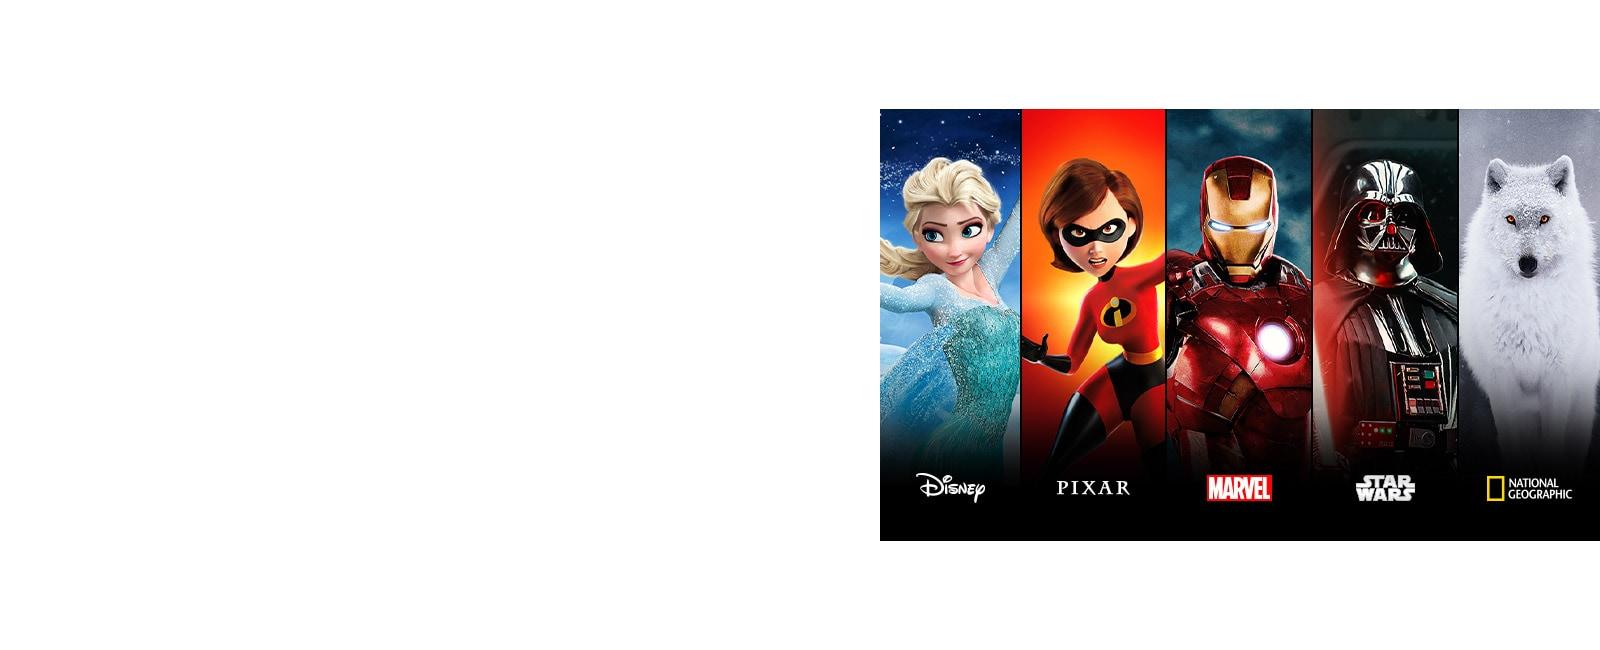 LG OLED48CXPTA Disney+